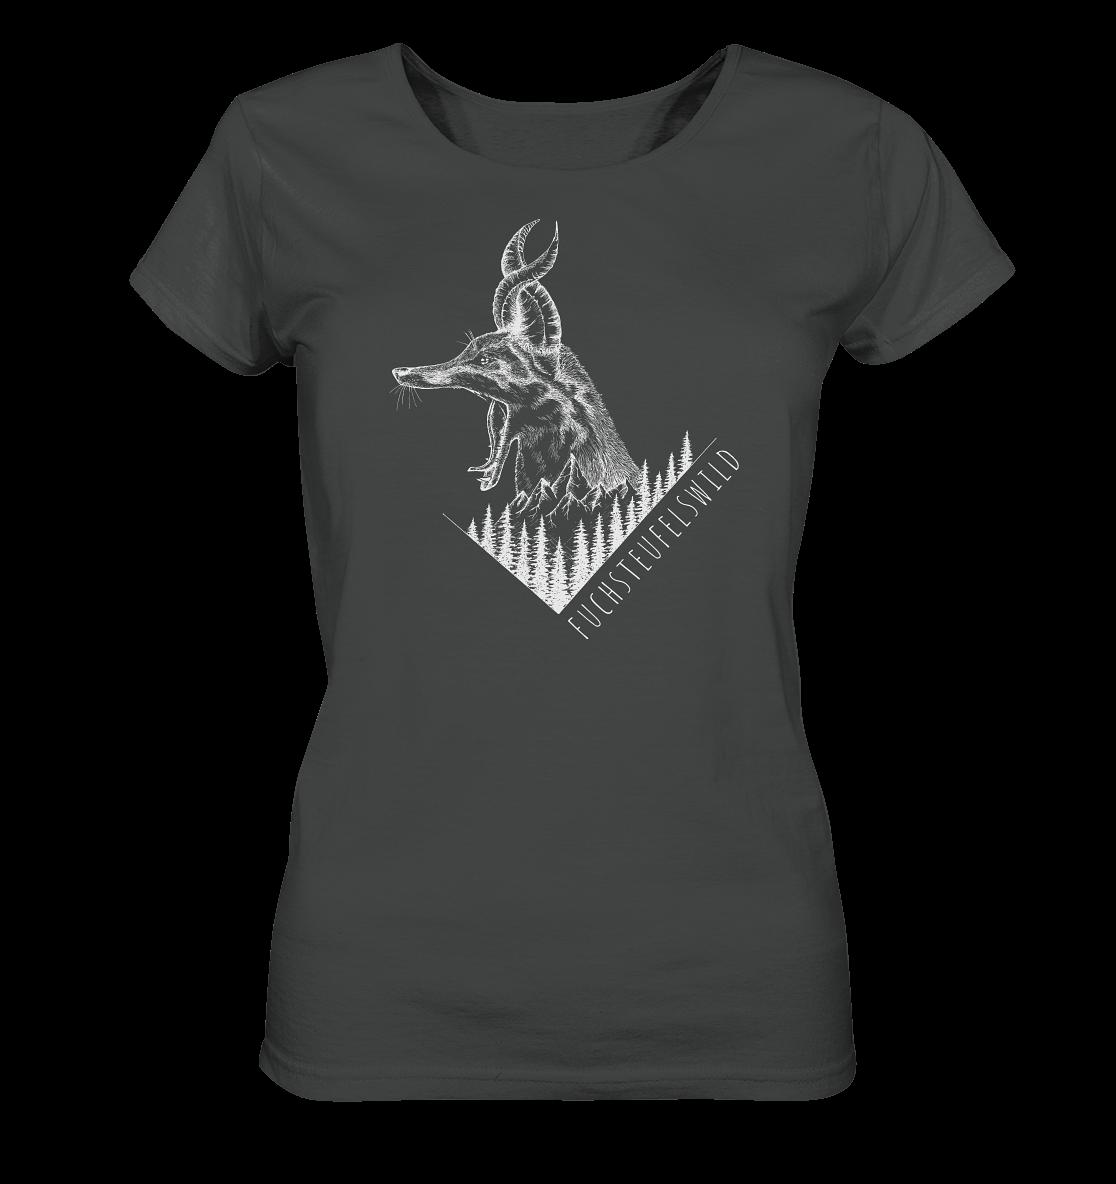 front-ladies-organic-shirt-444545-1116x-3.png